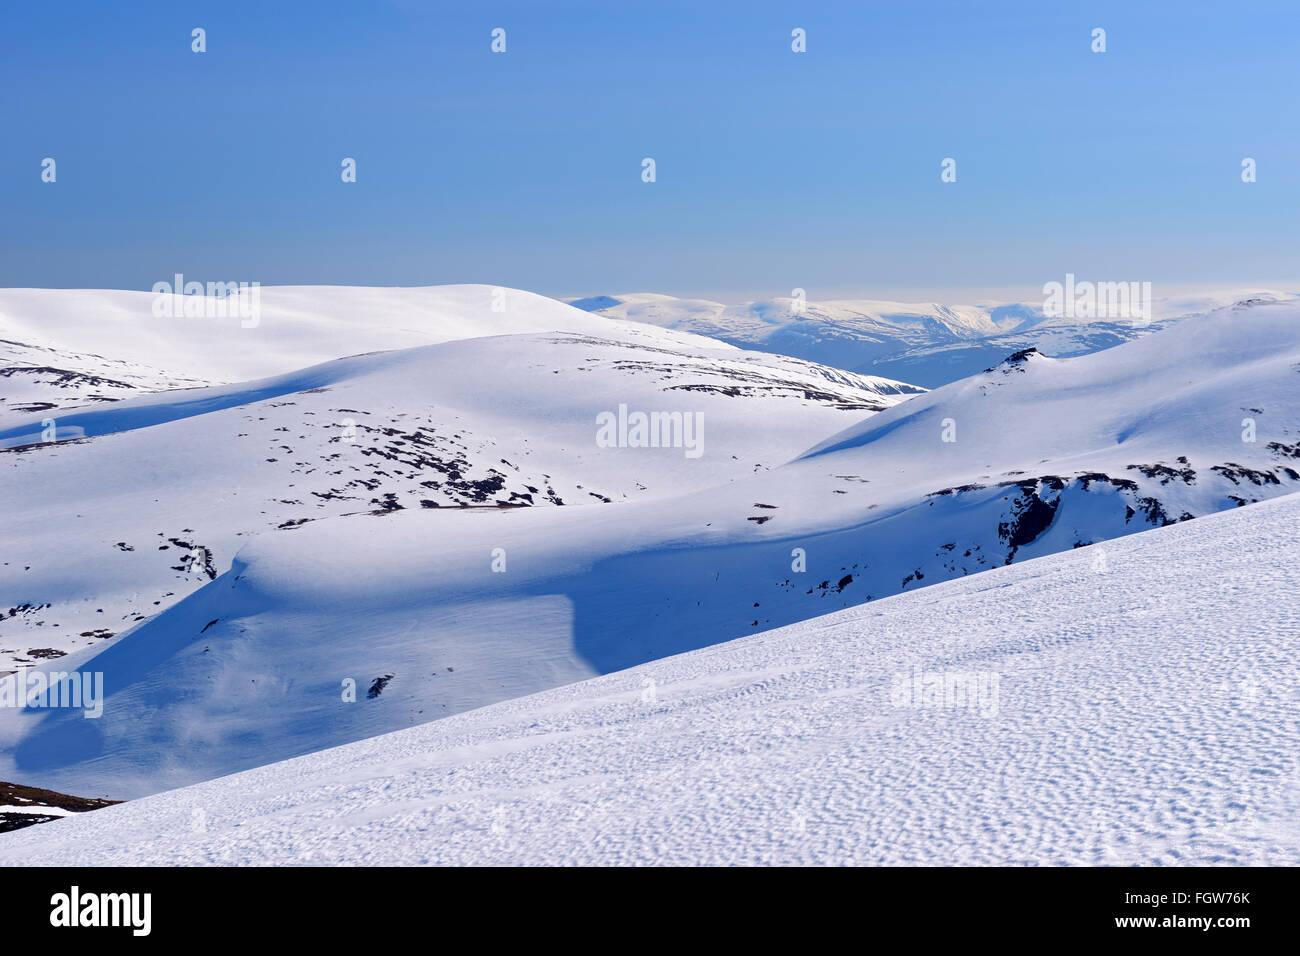 View across from Cairngorm Mountain Ski Centre, Aviemore, Scottish Highlands, UK - Stock Image